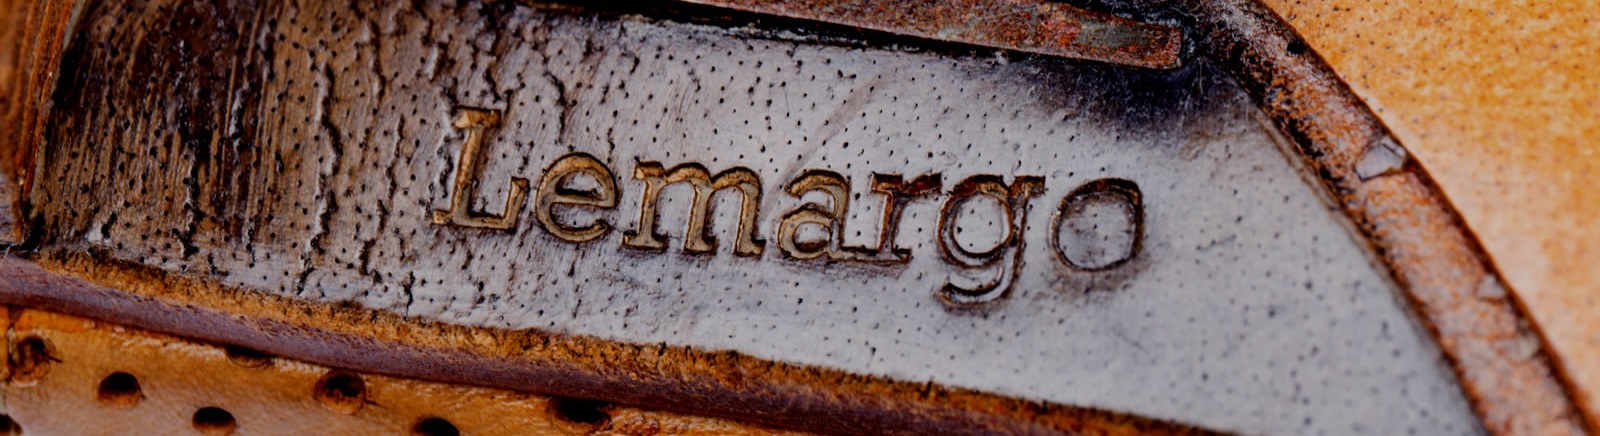 Lemargo Herrenschuhe online entdecken im Juppen Schuhe Shop